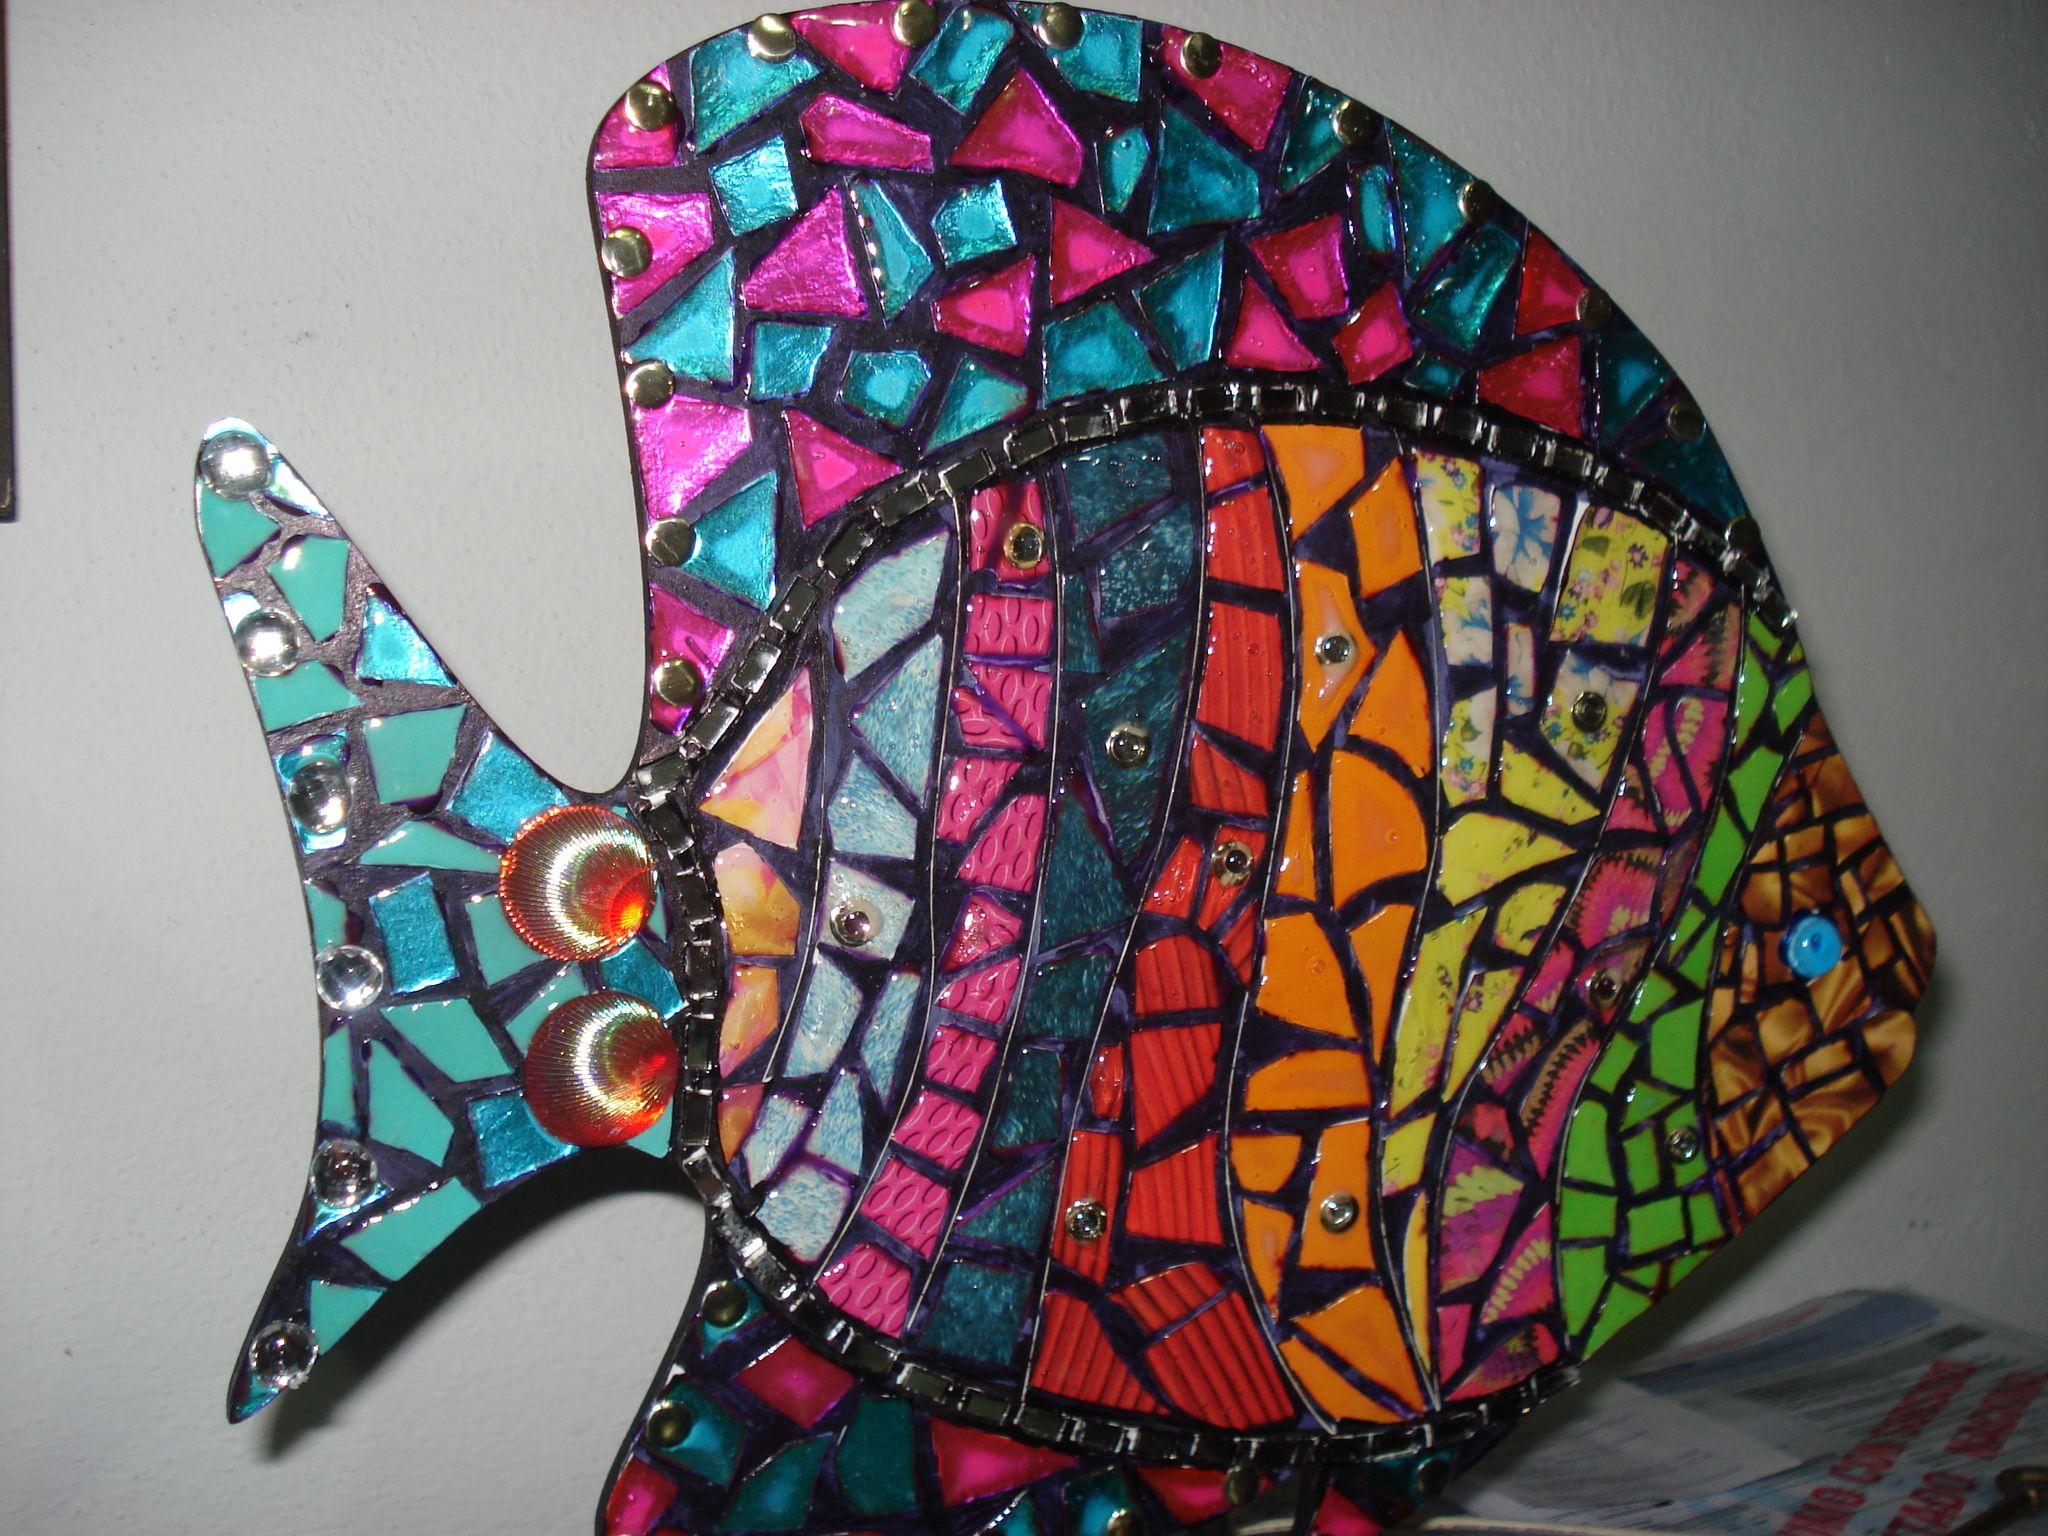 pez en colage o falso mosaiquismo